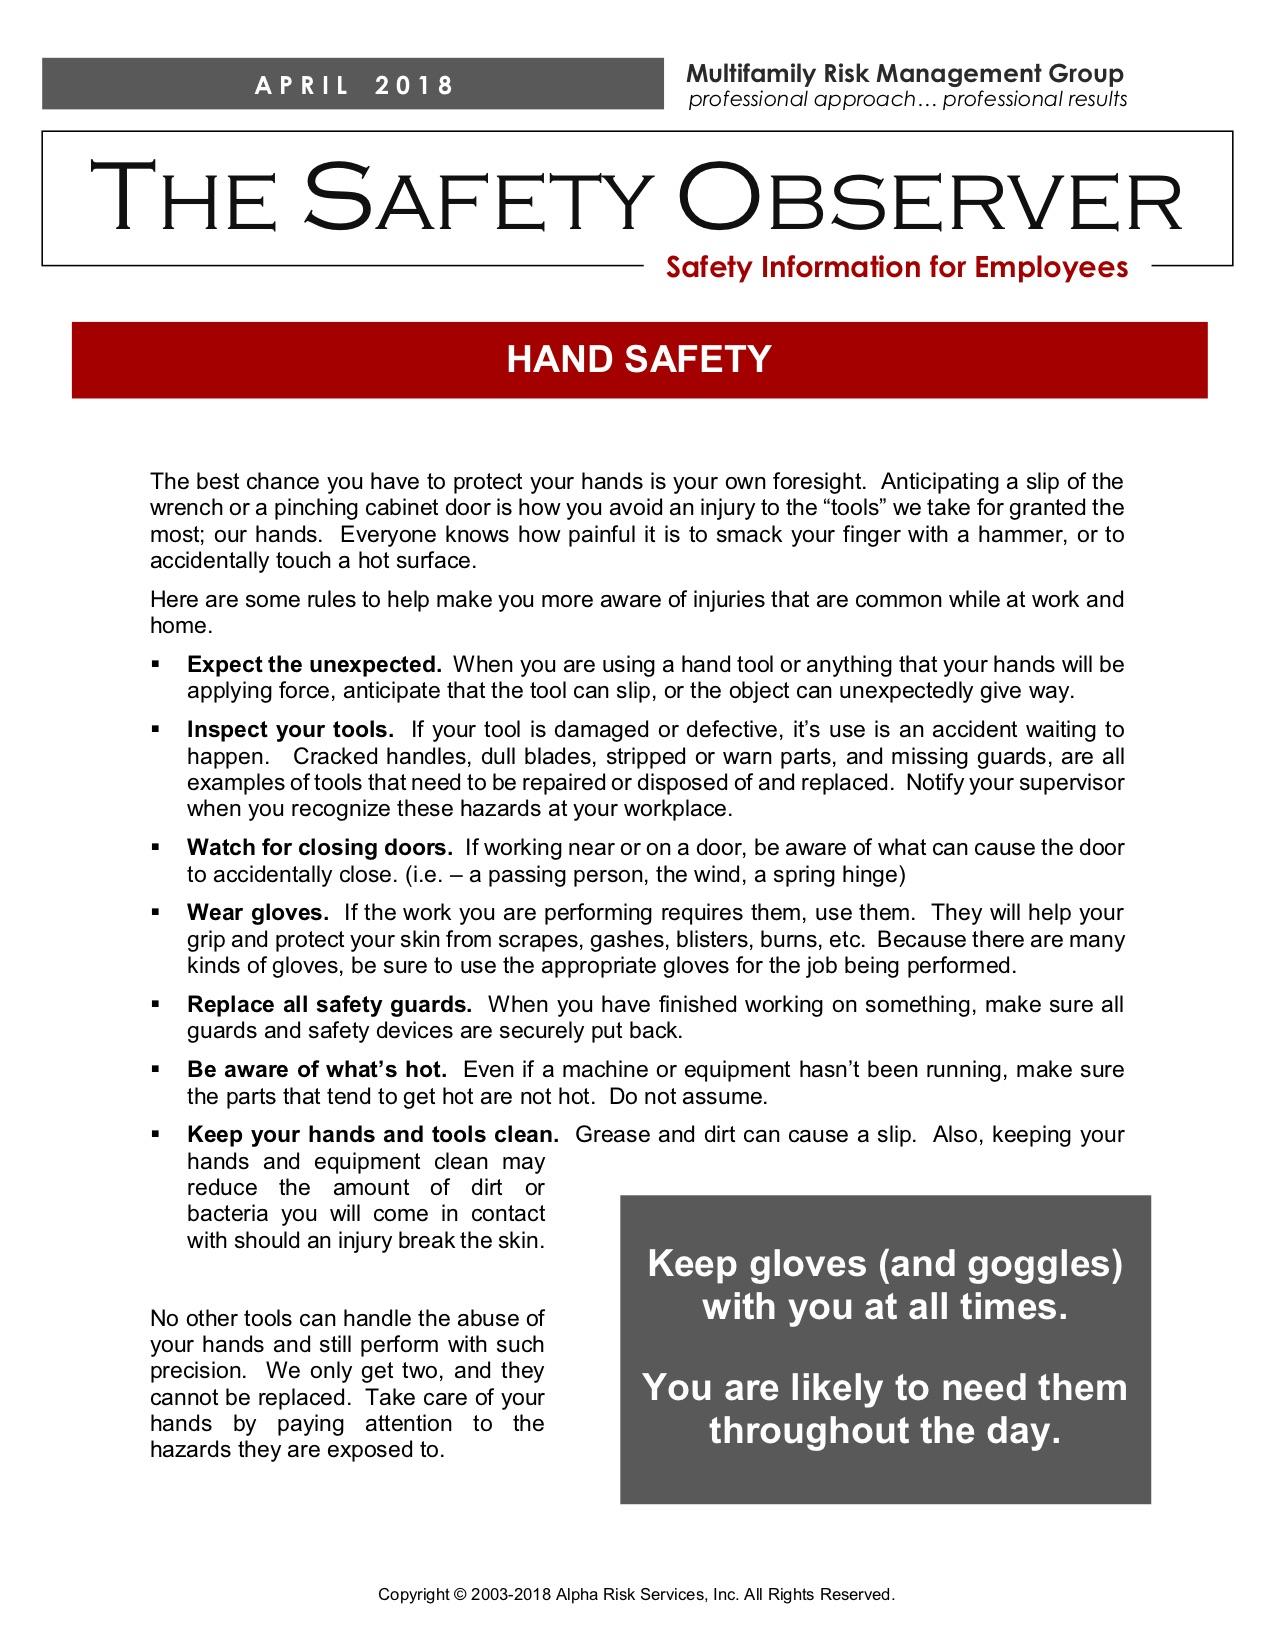 SO 4-18 Hand Safety.jpg